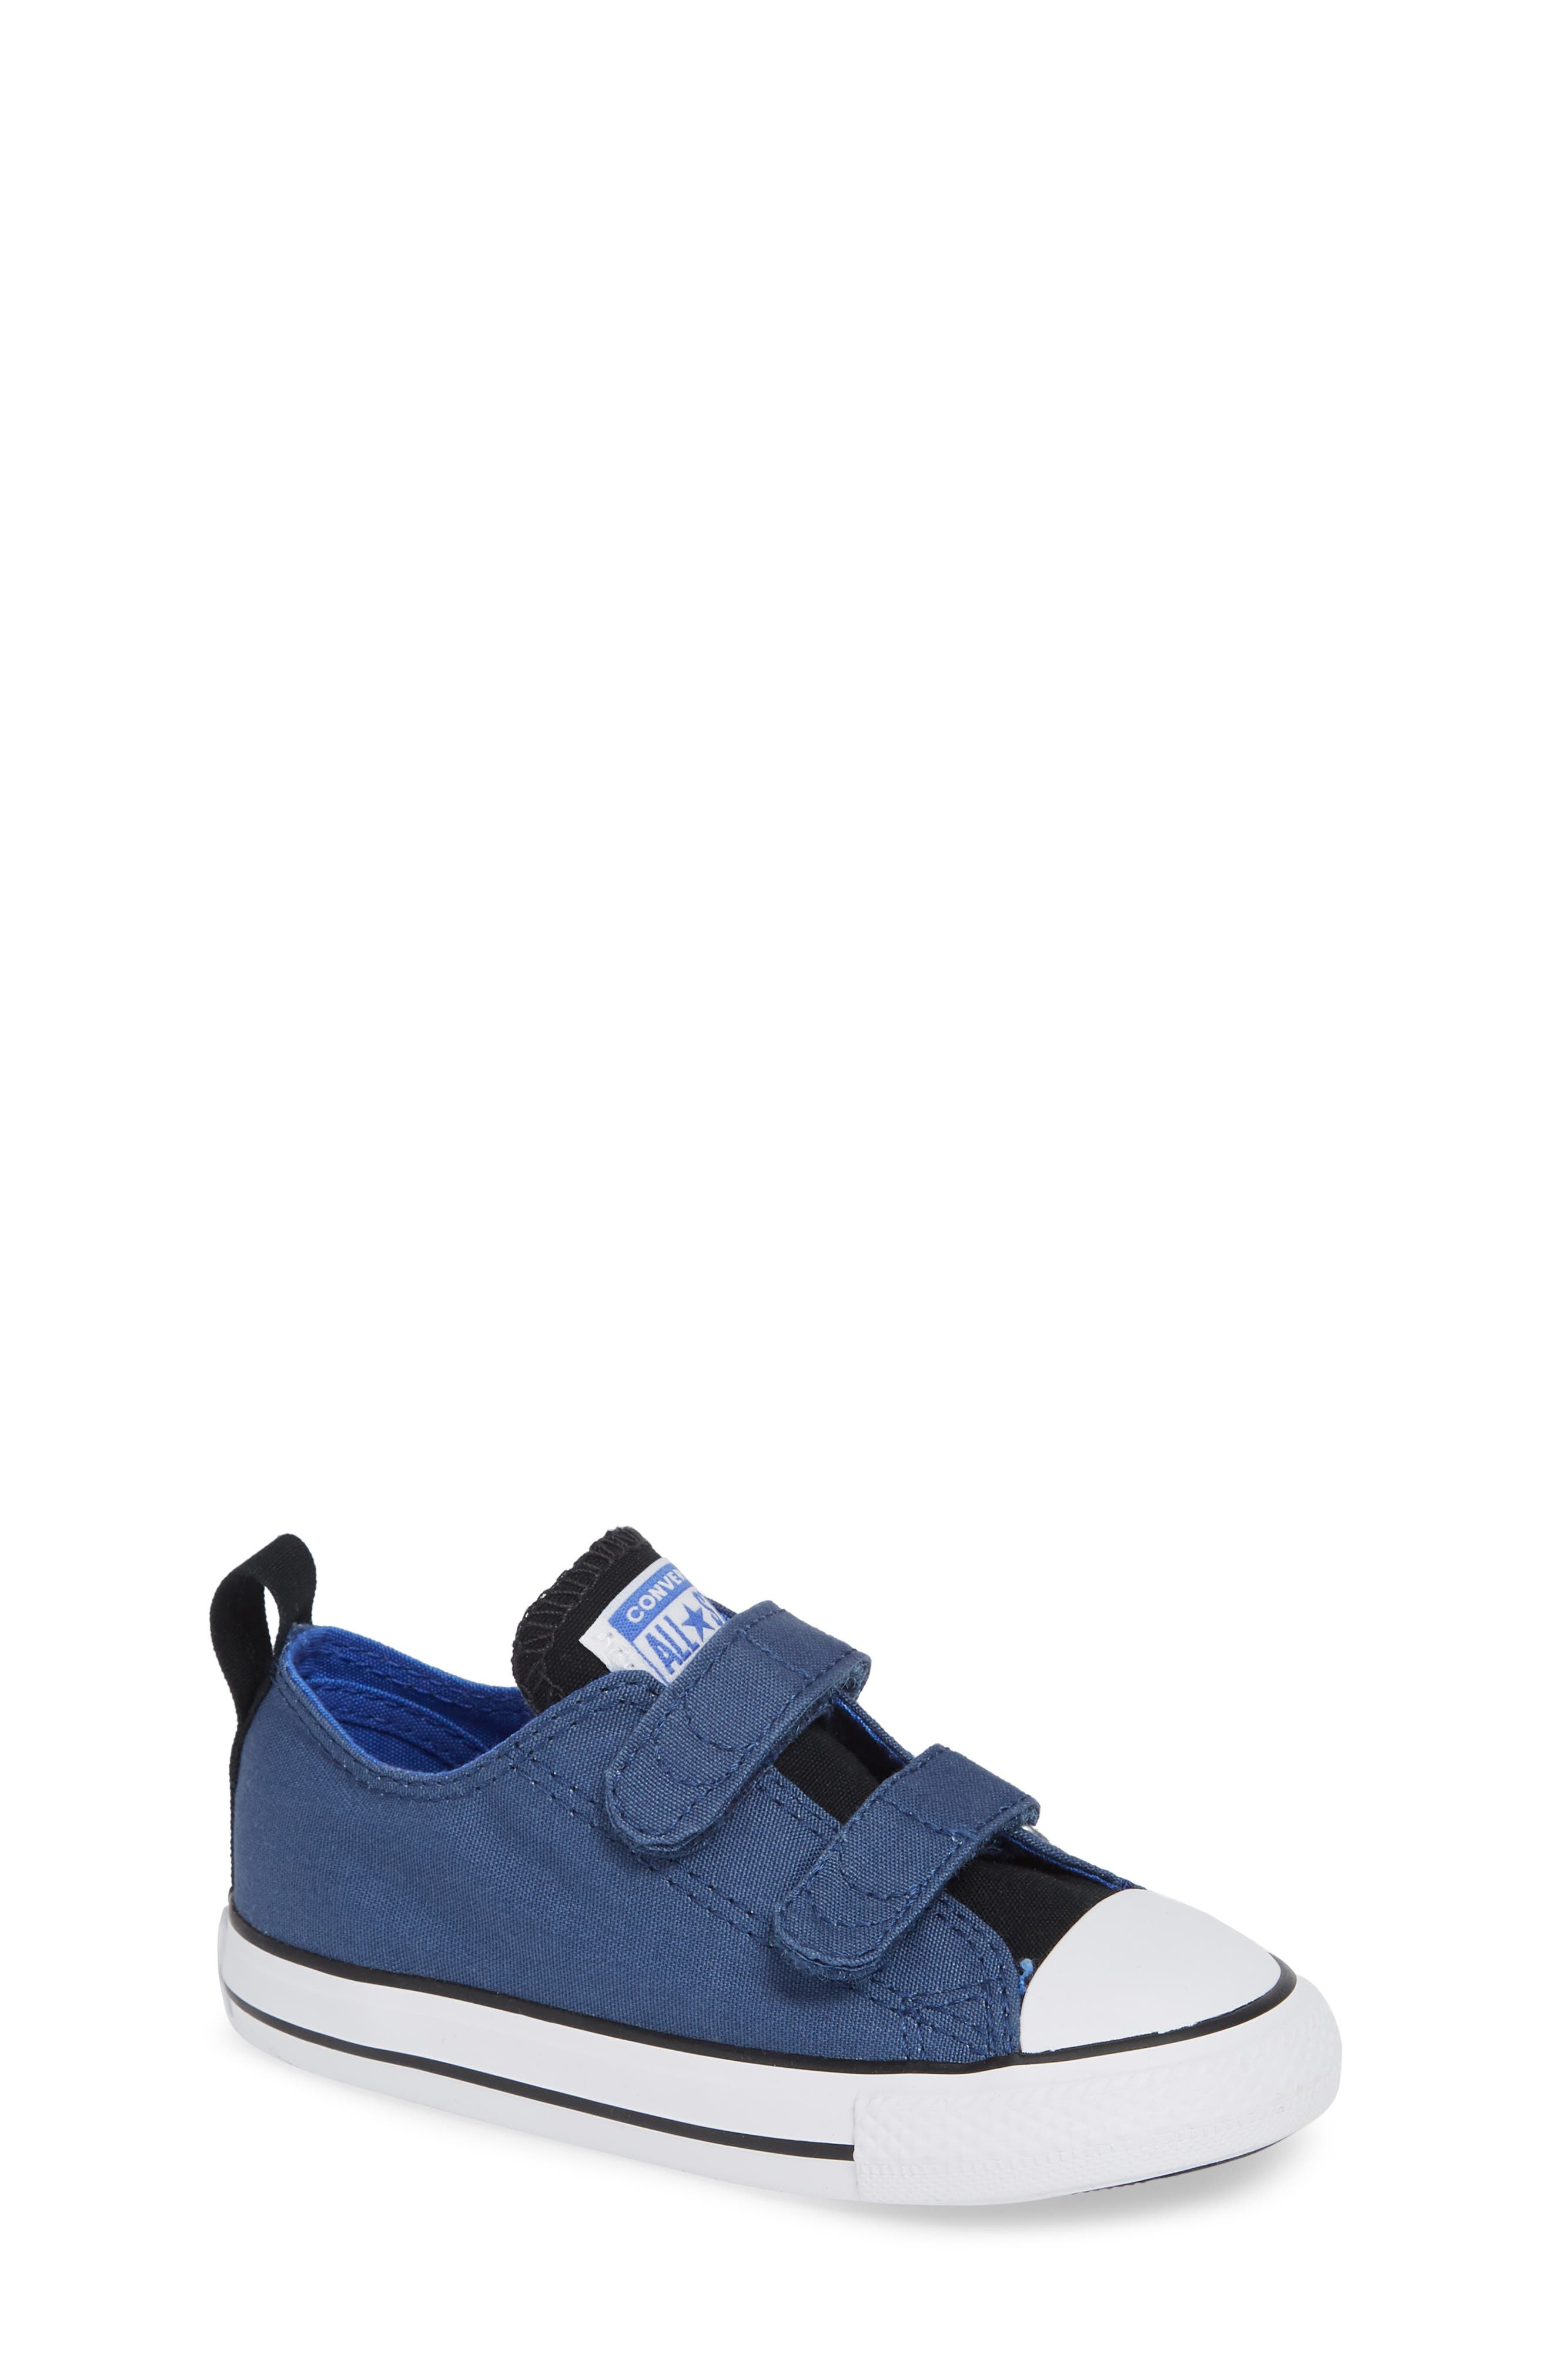 Chuck Taylor<sup>®</sup> 'Double Strap' Sneaker,                             Main thumbnail 1, color,                             Mason Blue